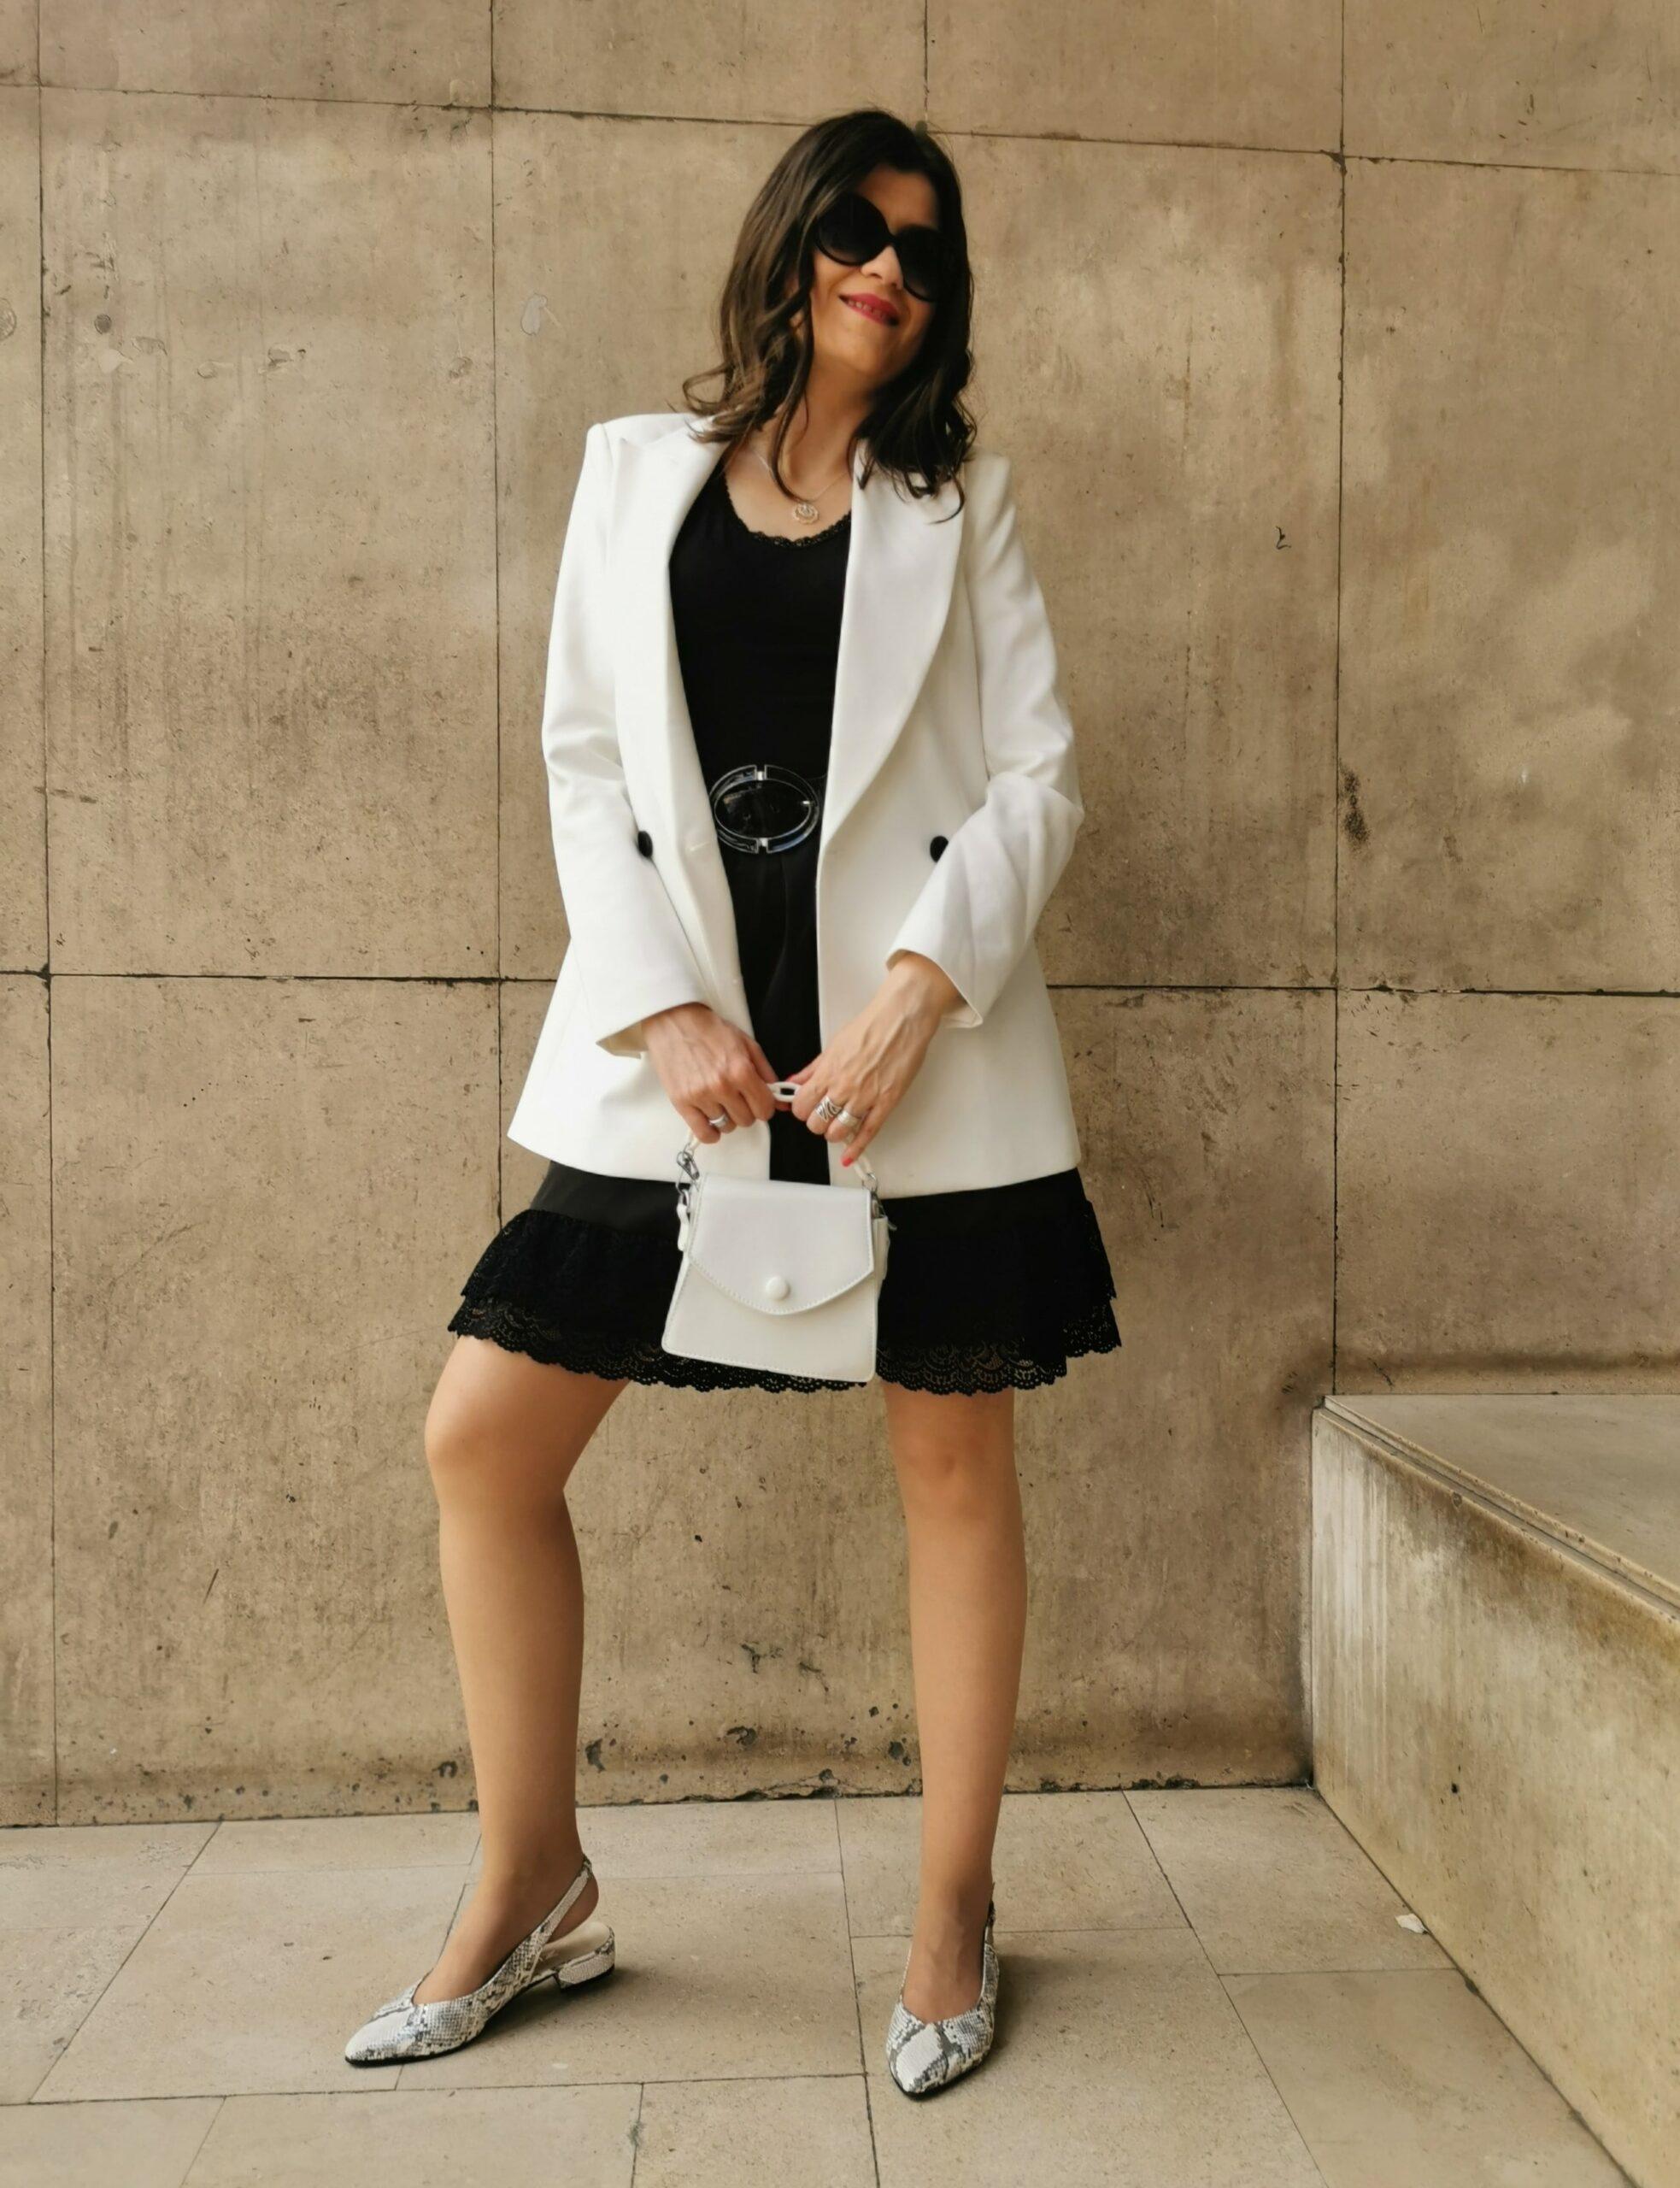 black & white outfit idea